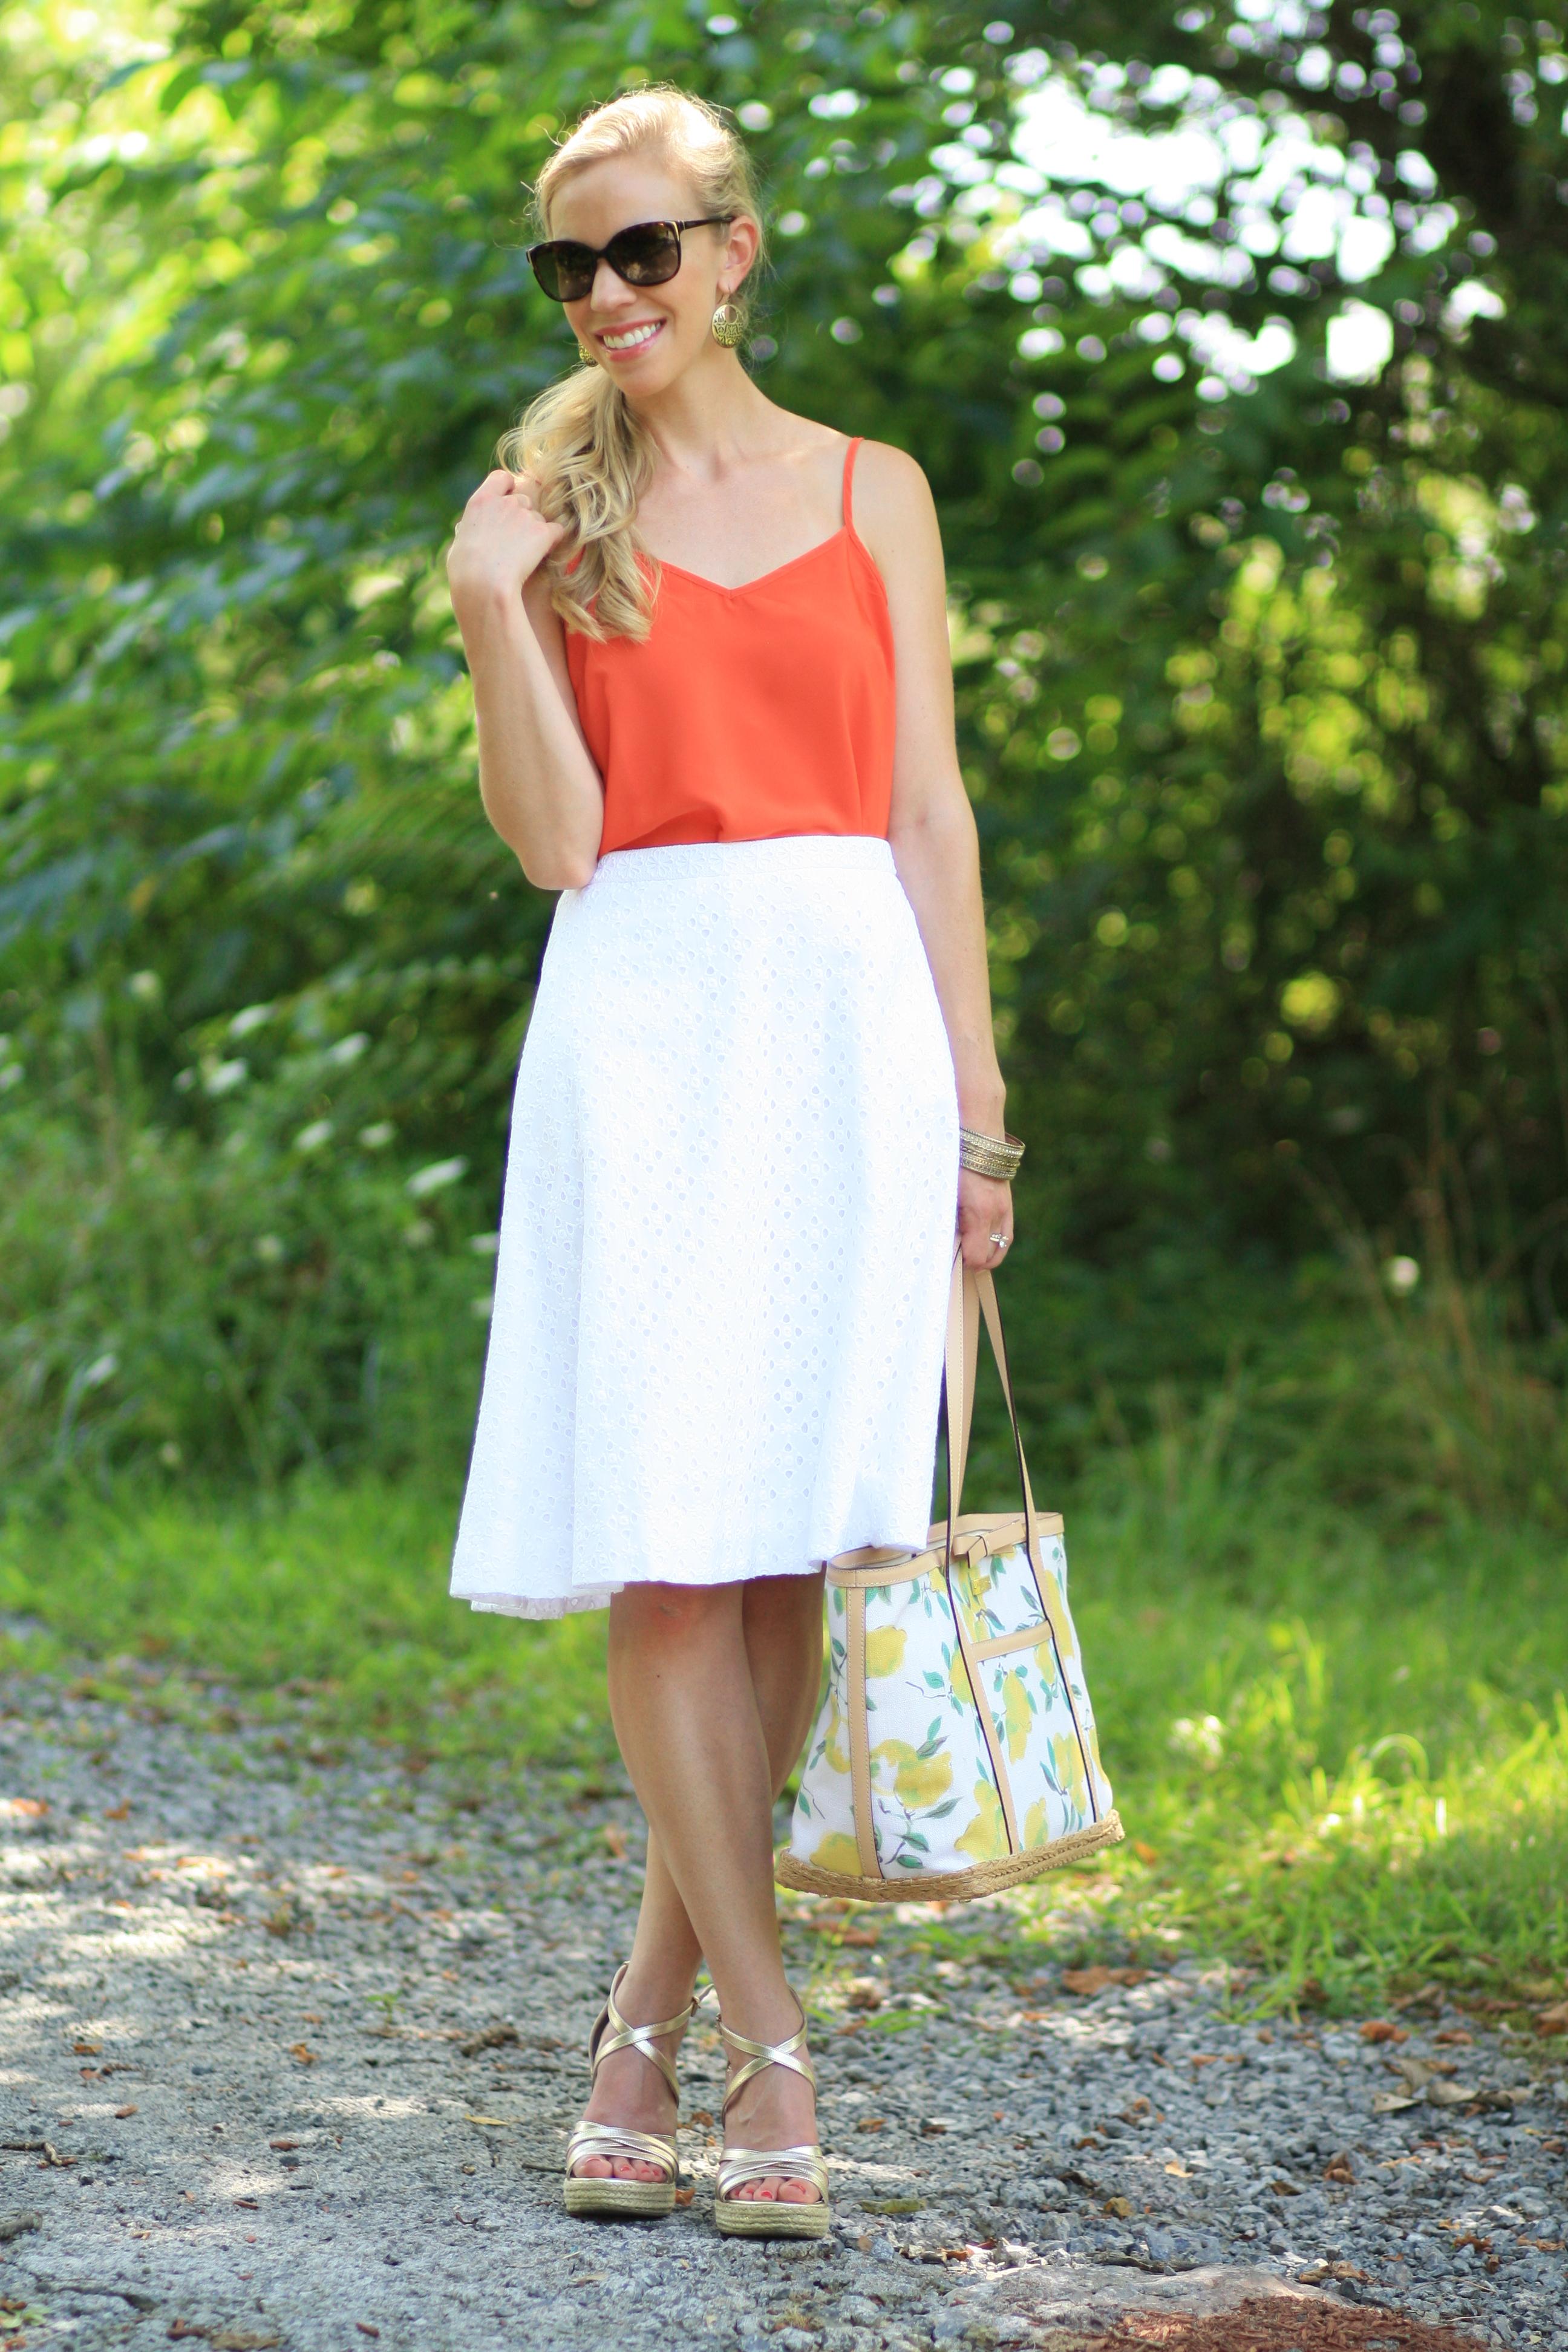 Citrus Eyelet: Orange cami, White midi skirt \u0026amp; Lemon-print tote }